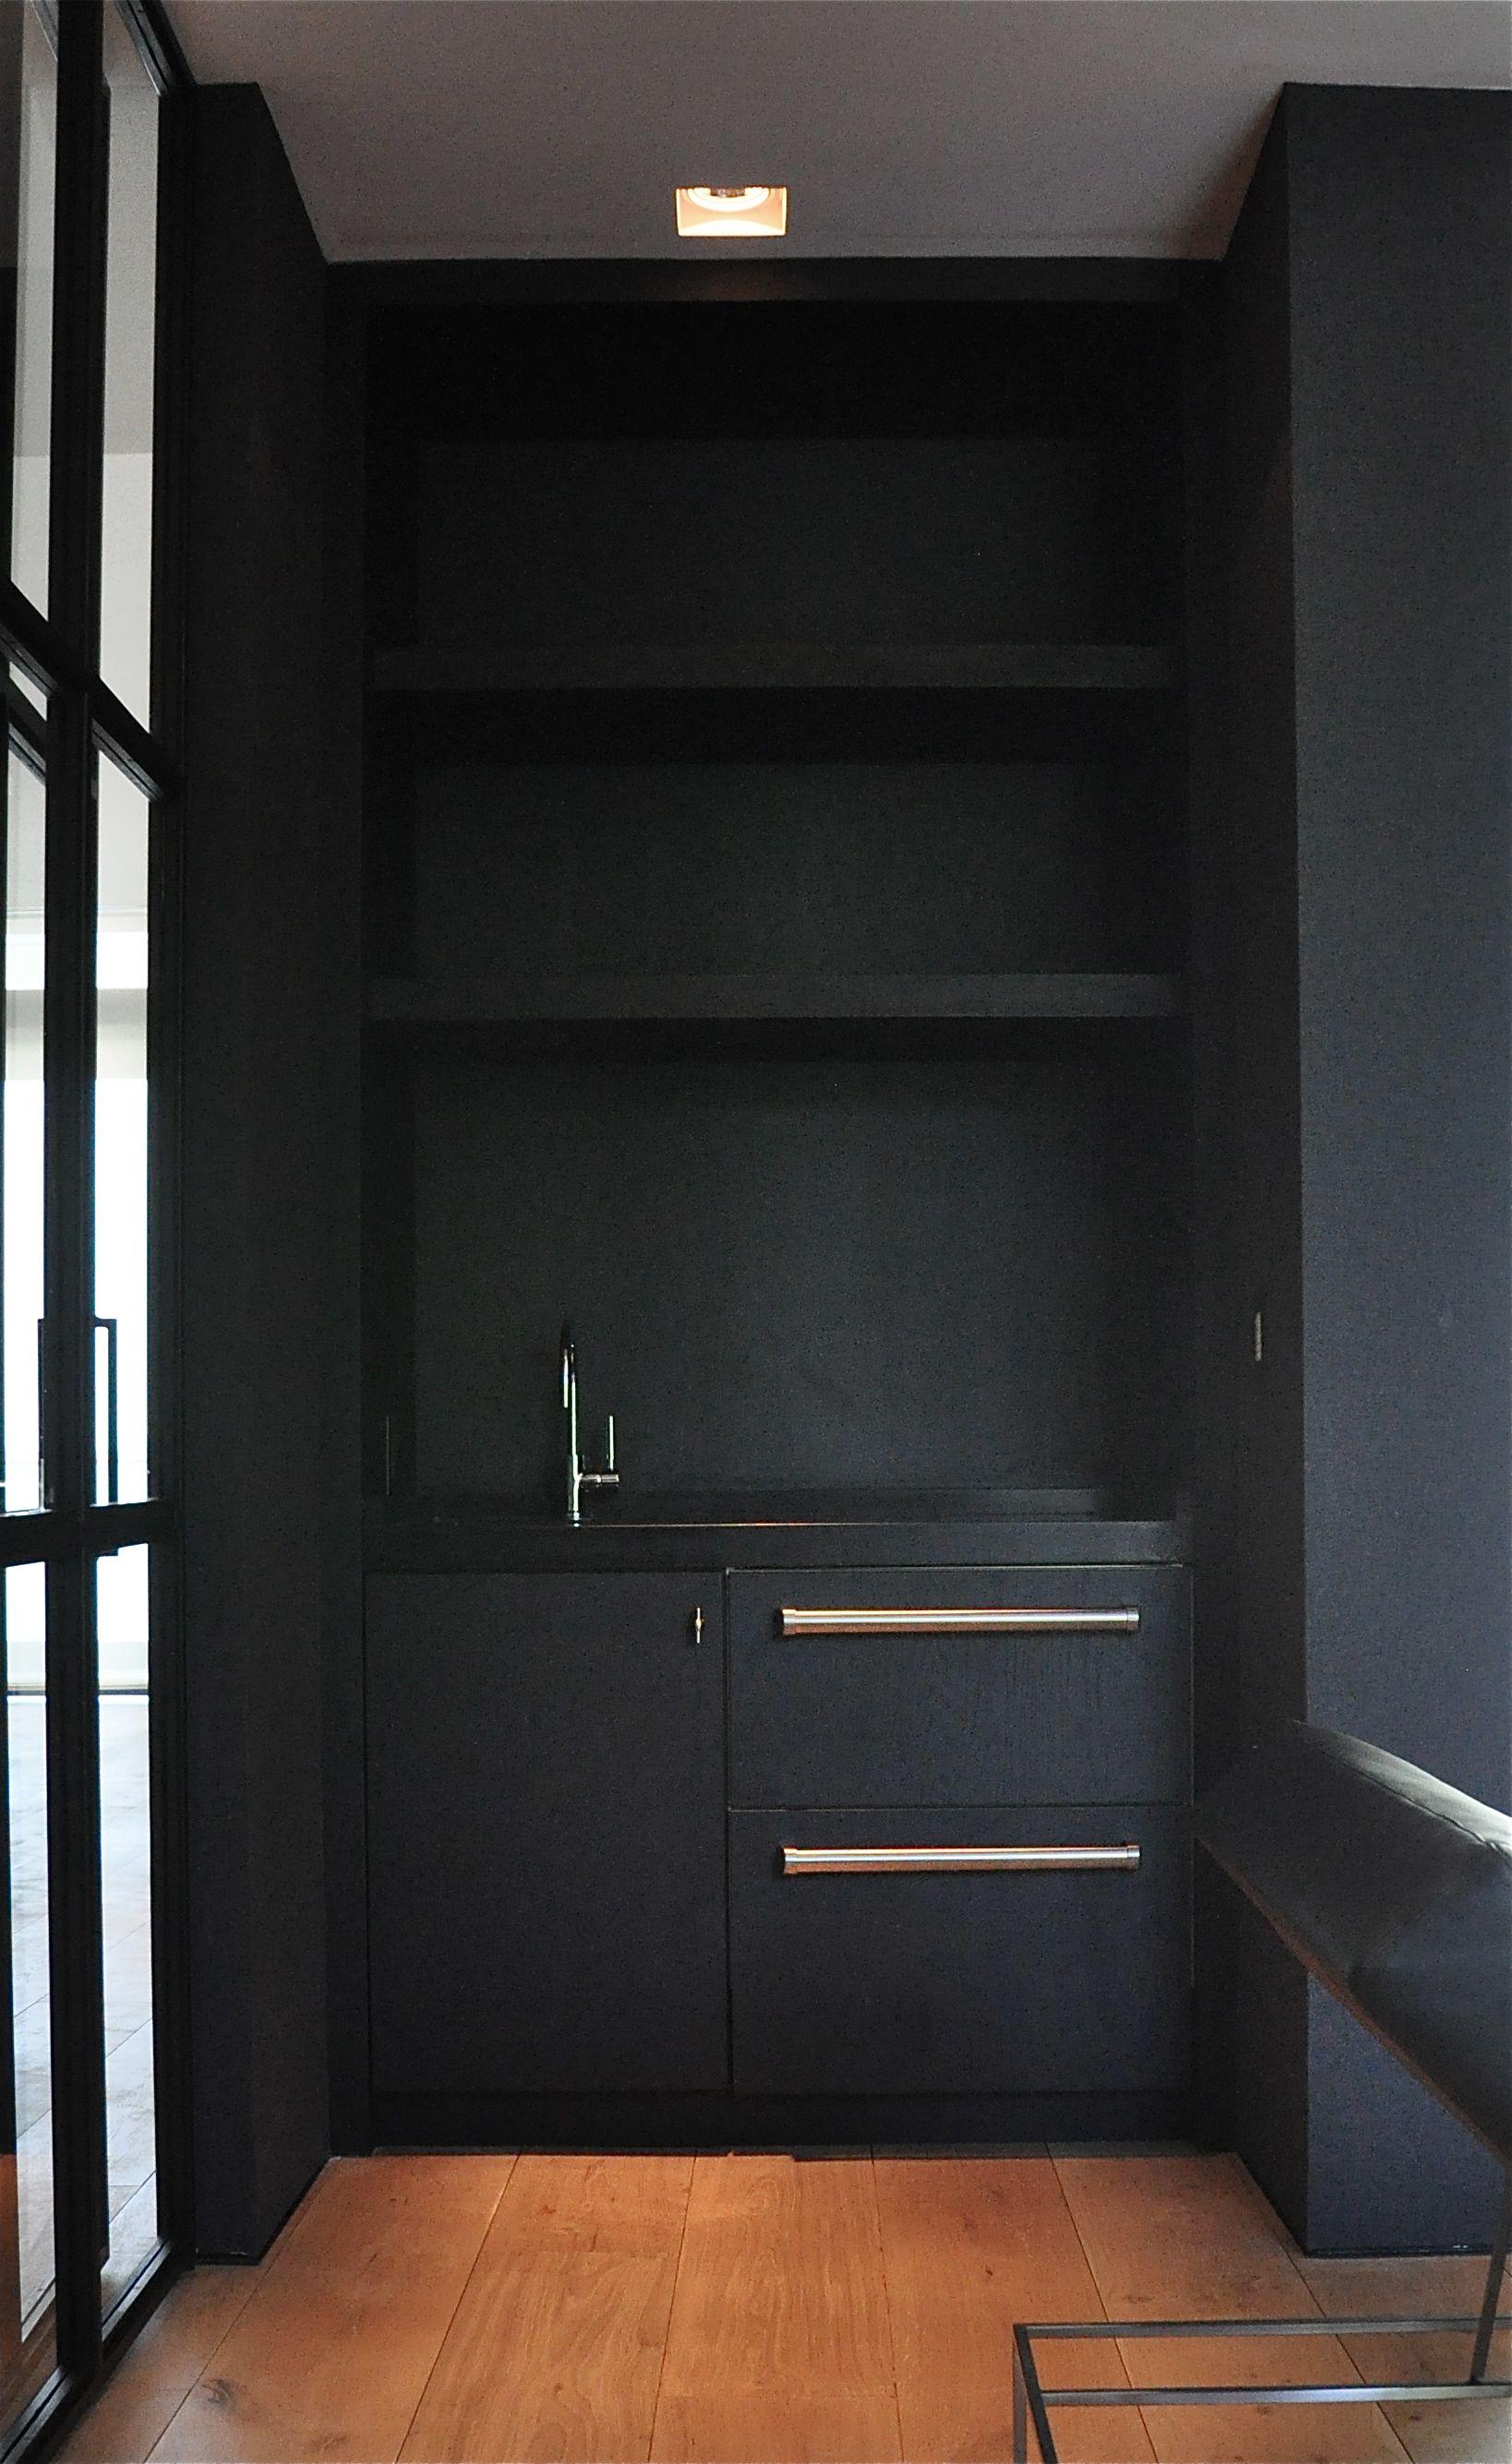 matt black and deep wood butler's pantry mb residence Briggs Solomon